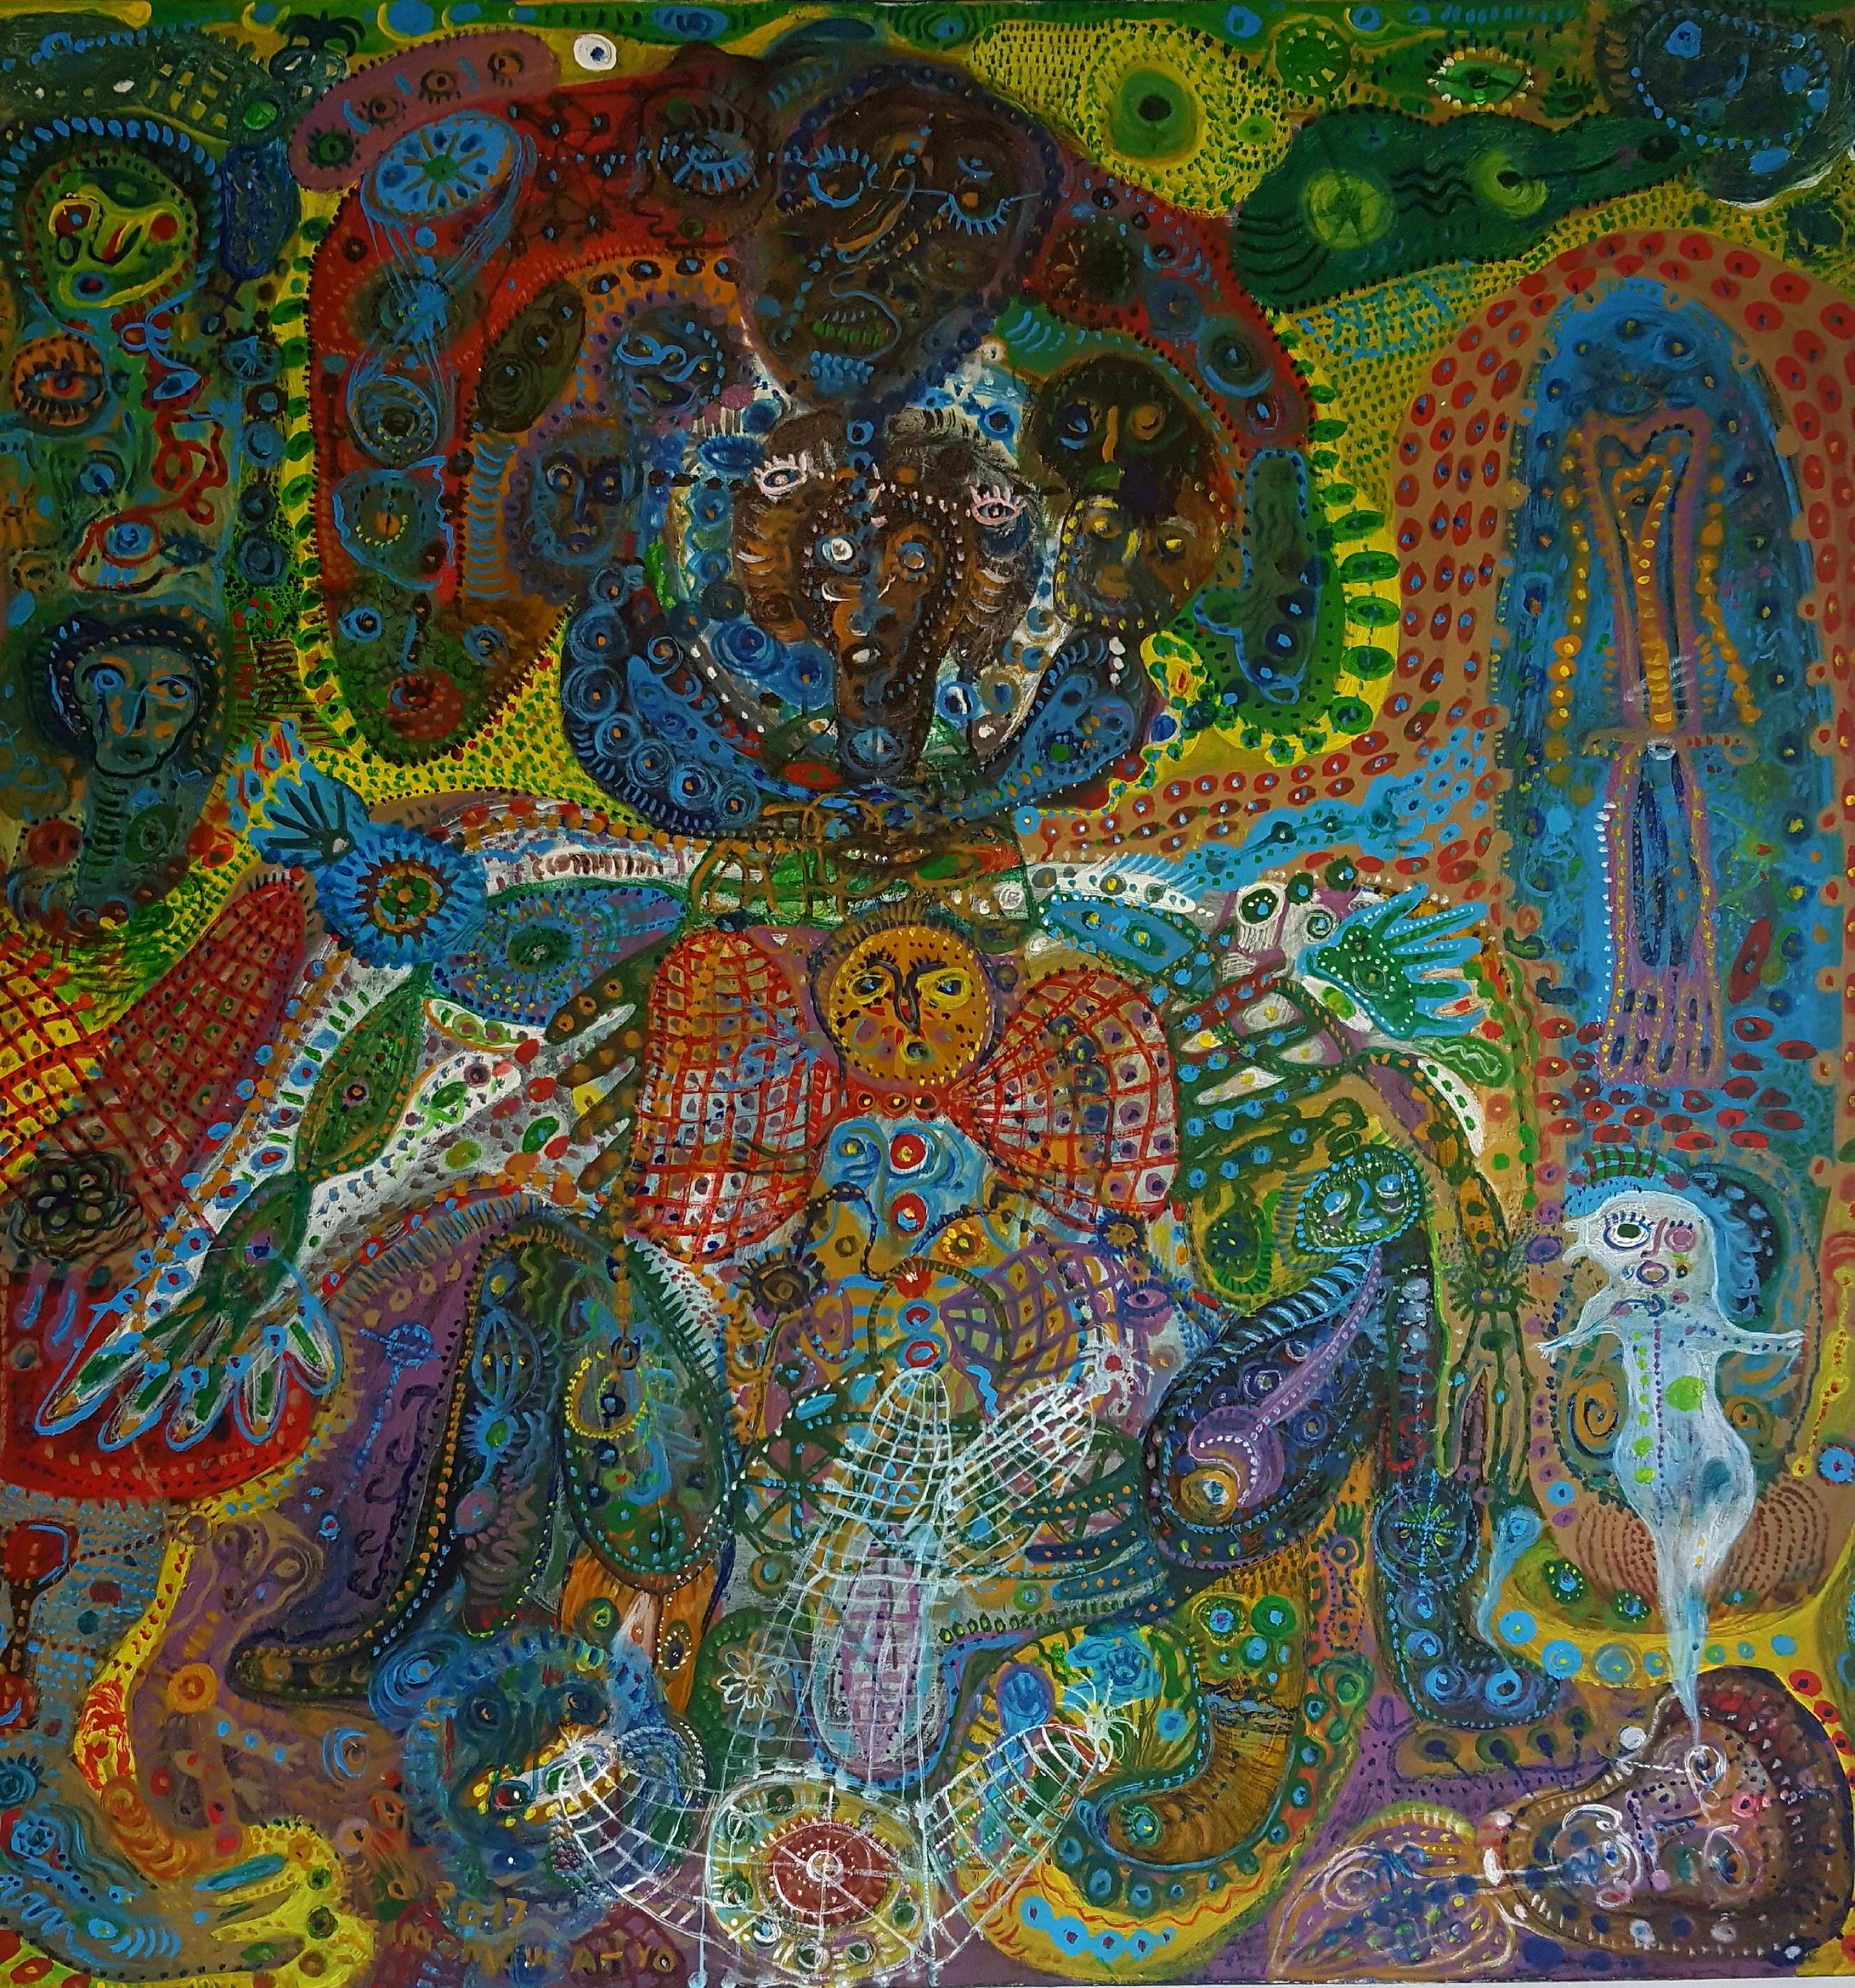 Art work by Imam Sucahyo - image R. Horstman